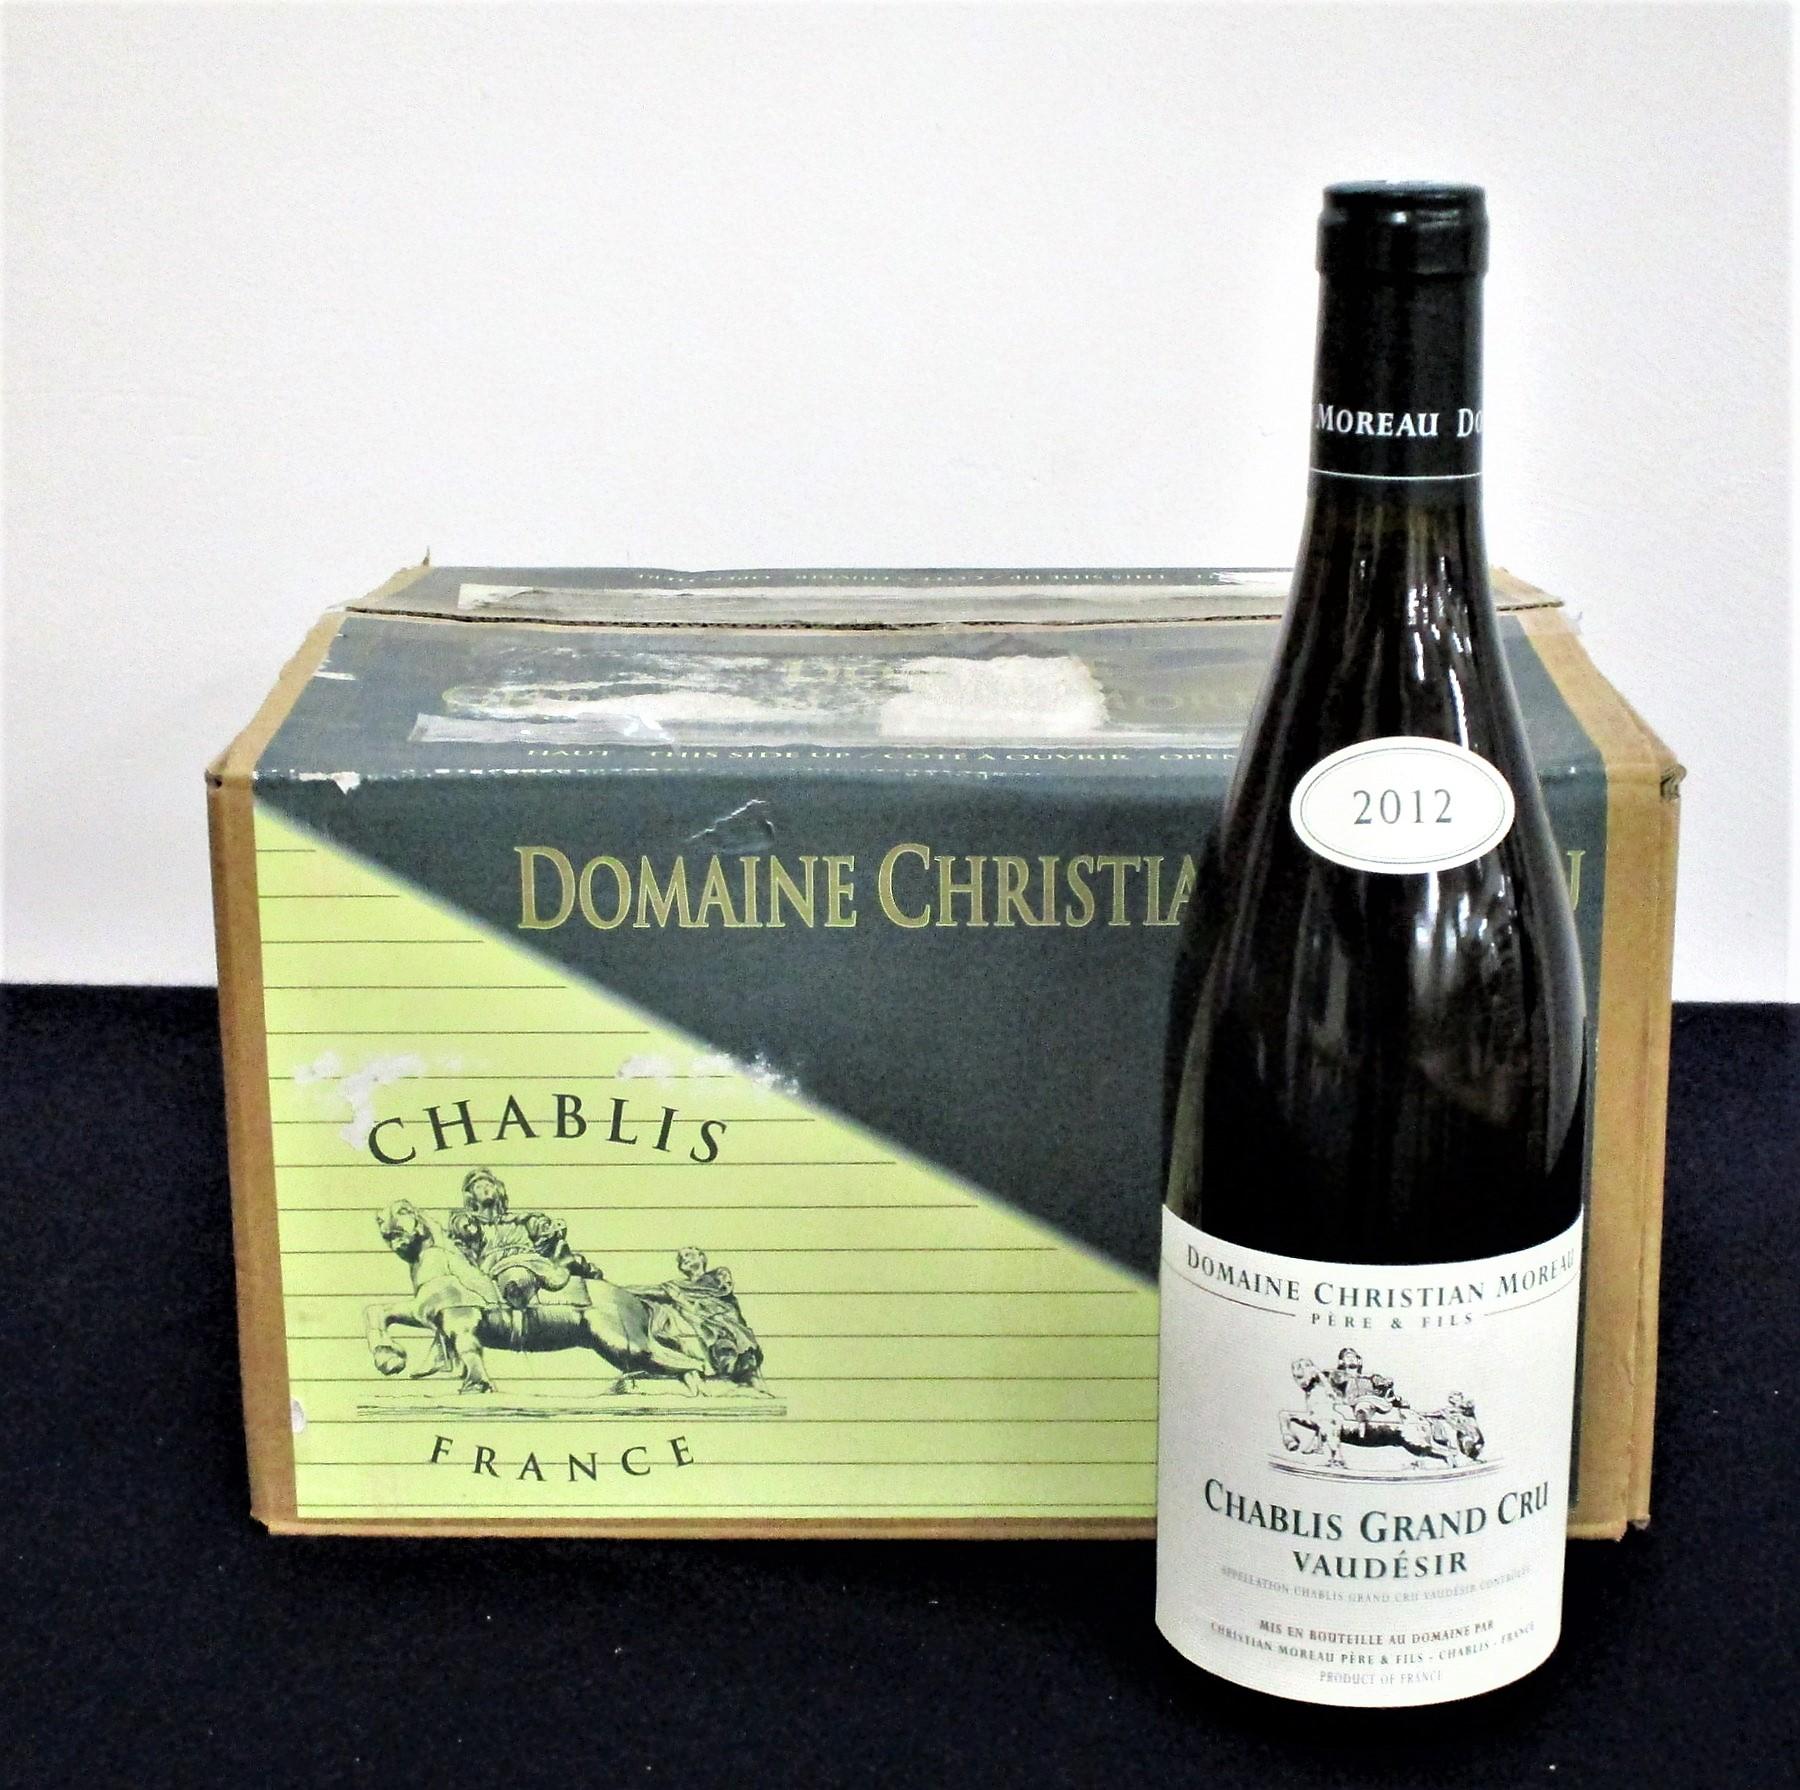 12 bts Chablis Grand Cru Vaudésir 2012 Dom Christian Moreau